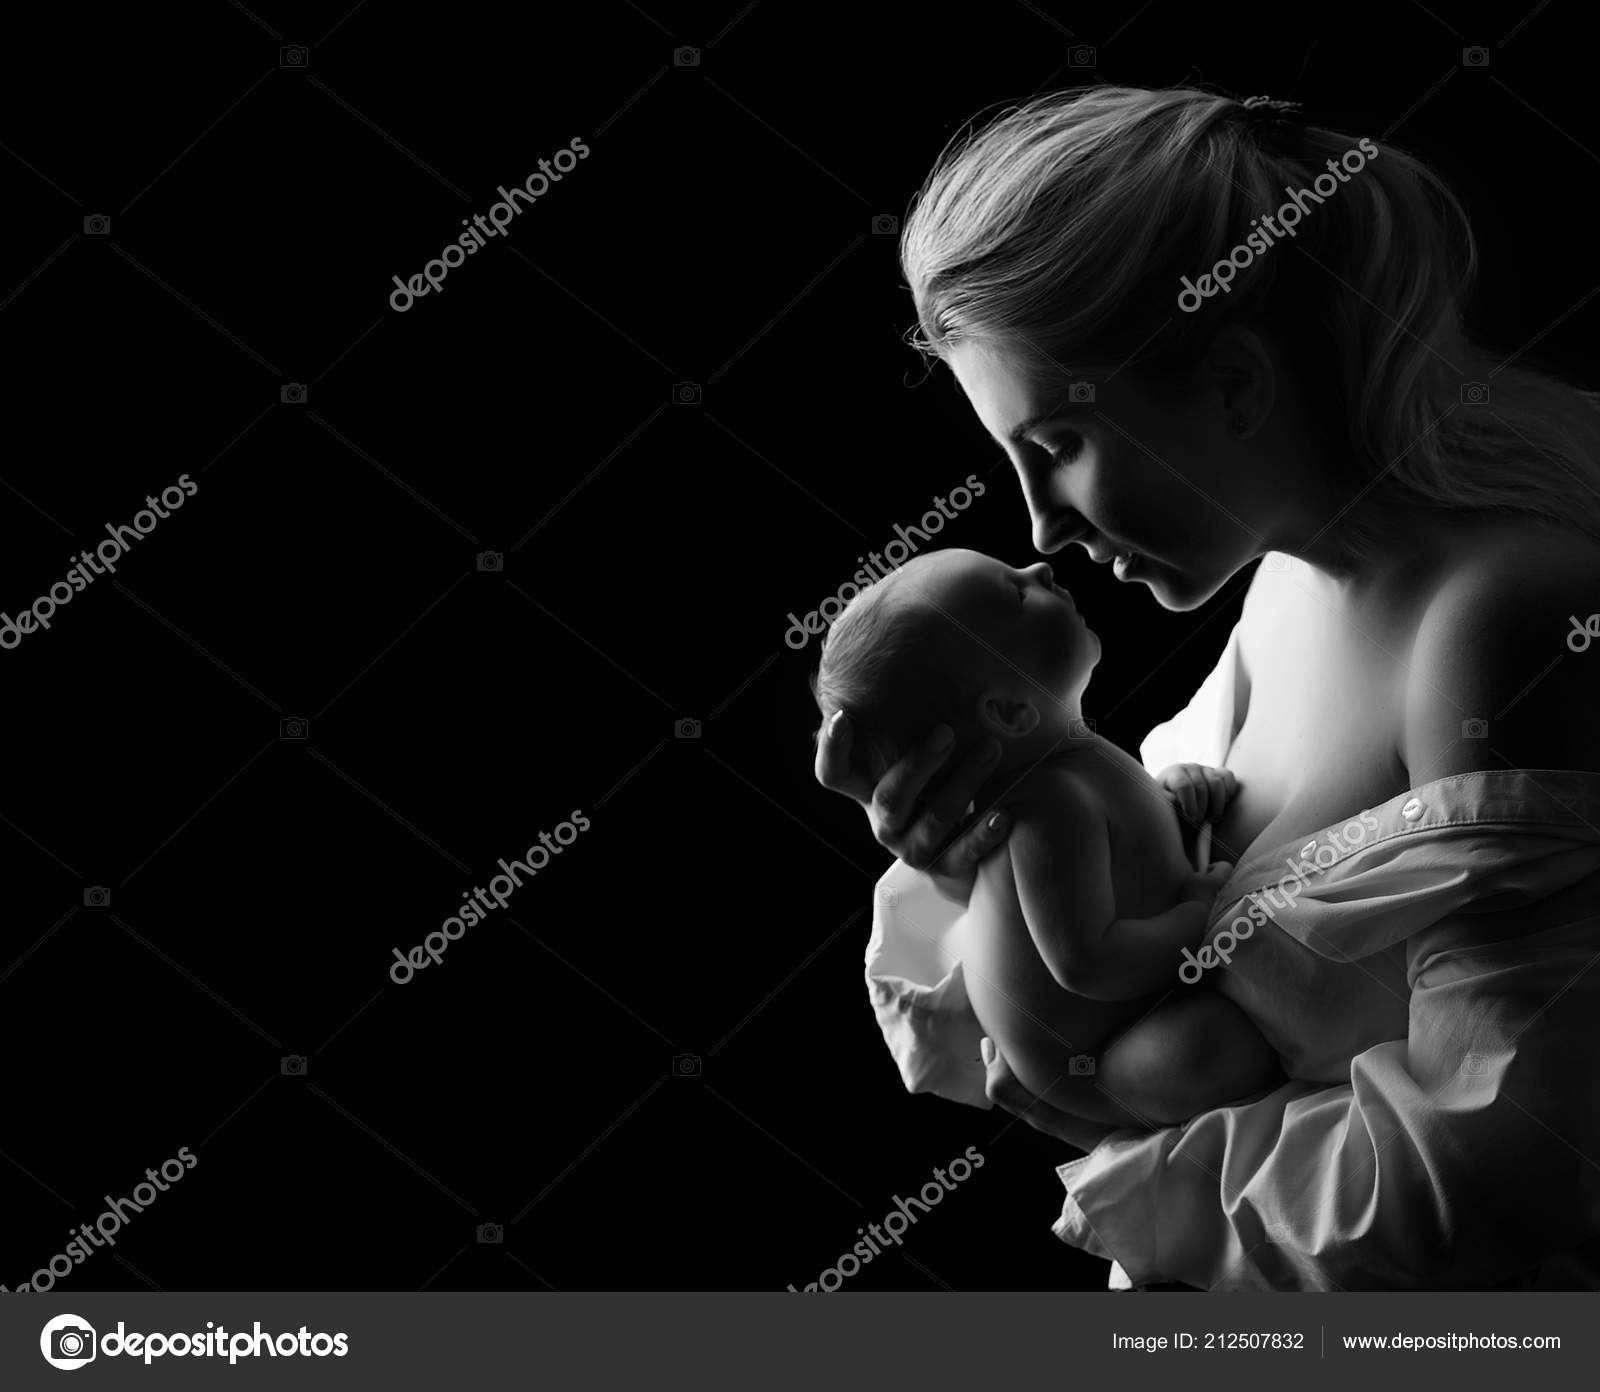 Black White Art Photo Beautiful Mother Holding Baby Boy Stock Photo C Larysa04dubynska 212507832